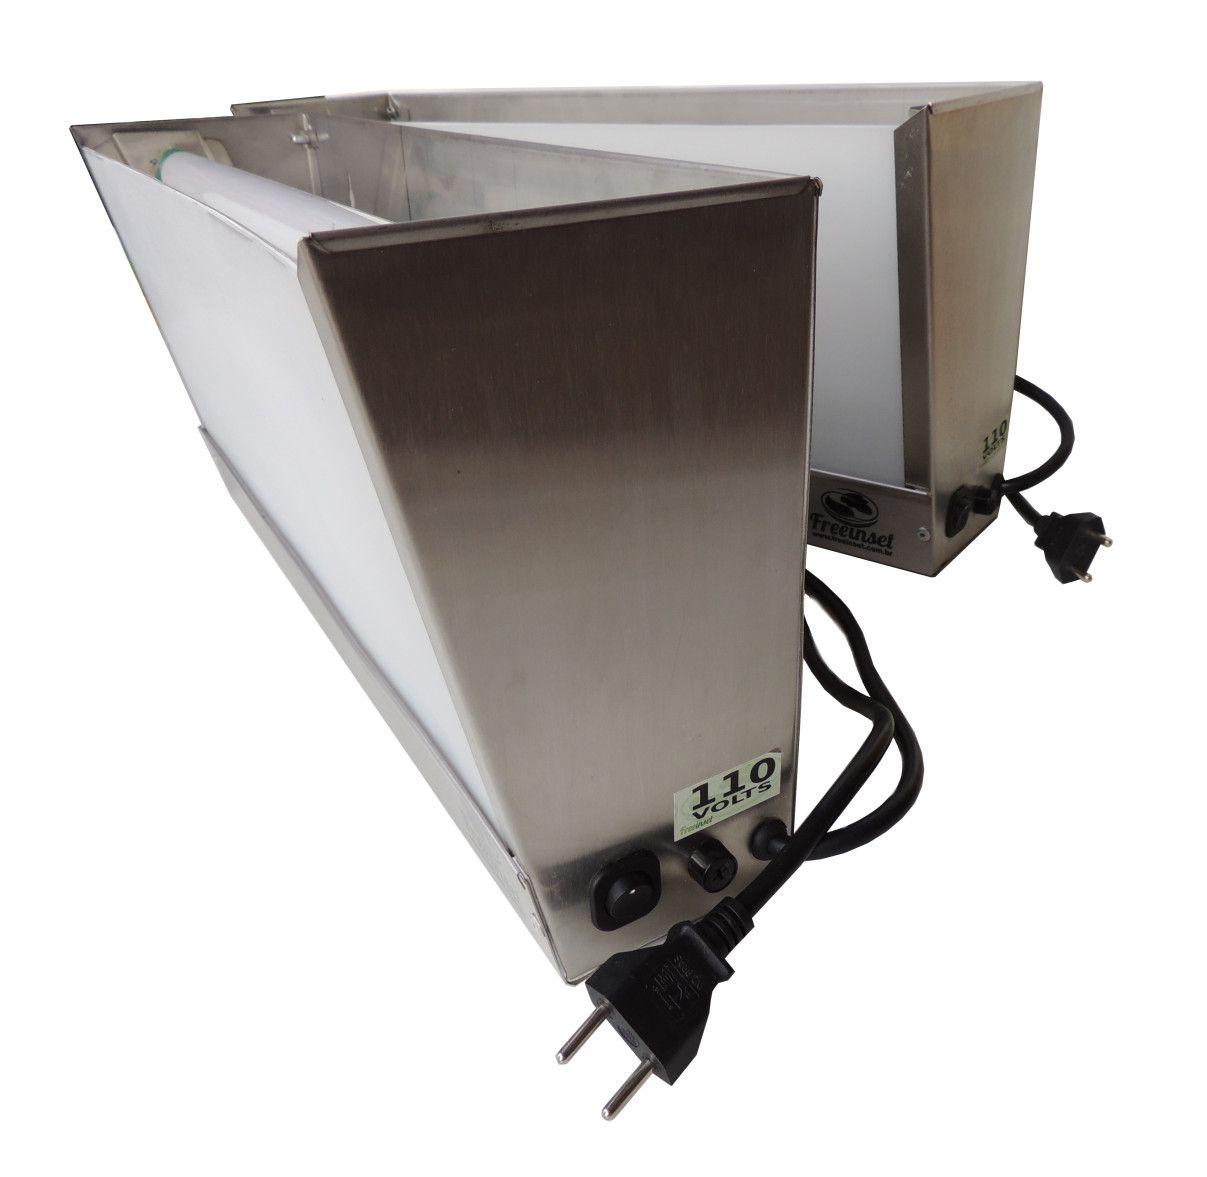 Armadilhas Luminosas TOP, 60w, até 110m², Bivolt, Aço Inox Escovado